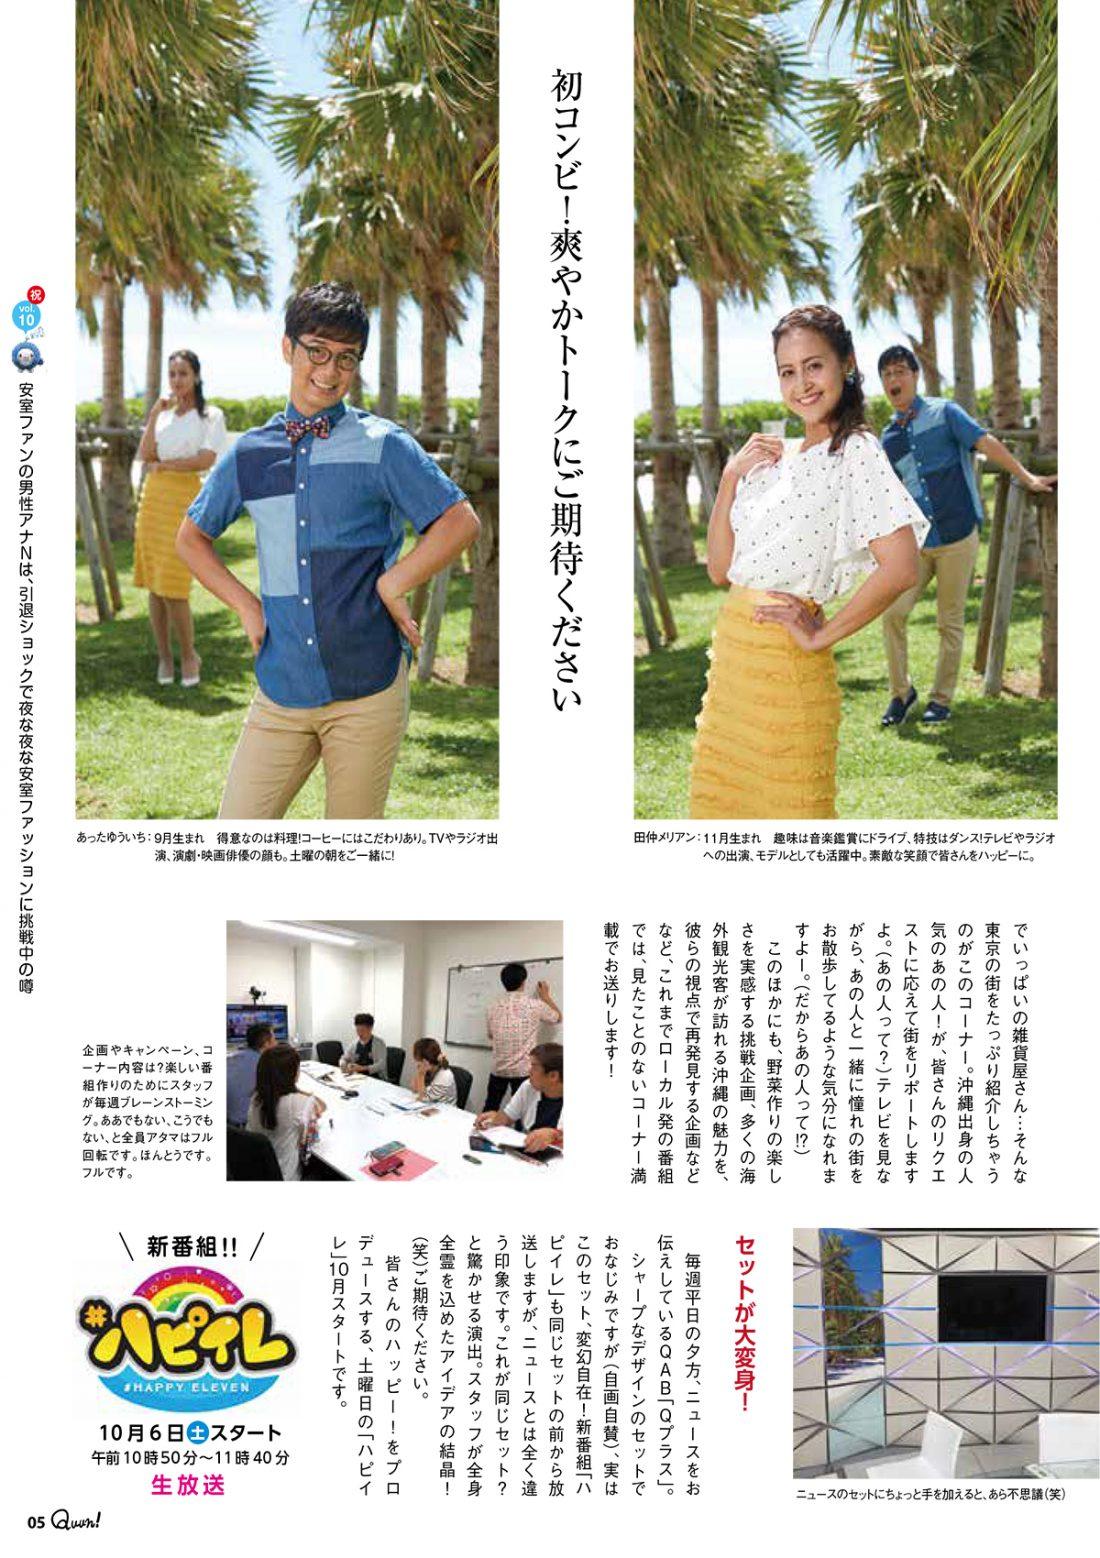 http://www.qab.co.jp/qgoro/wp-content/uploads/quun_1007-1100x1558.jpg